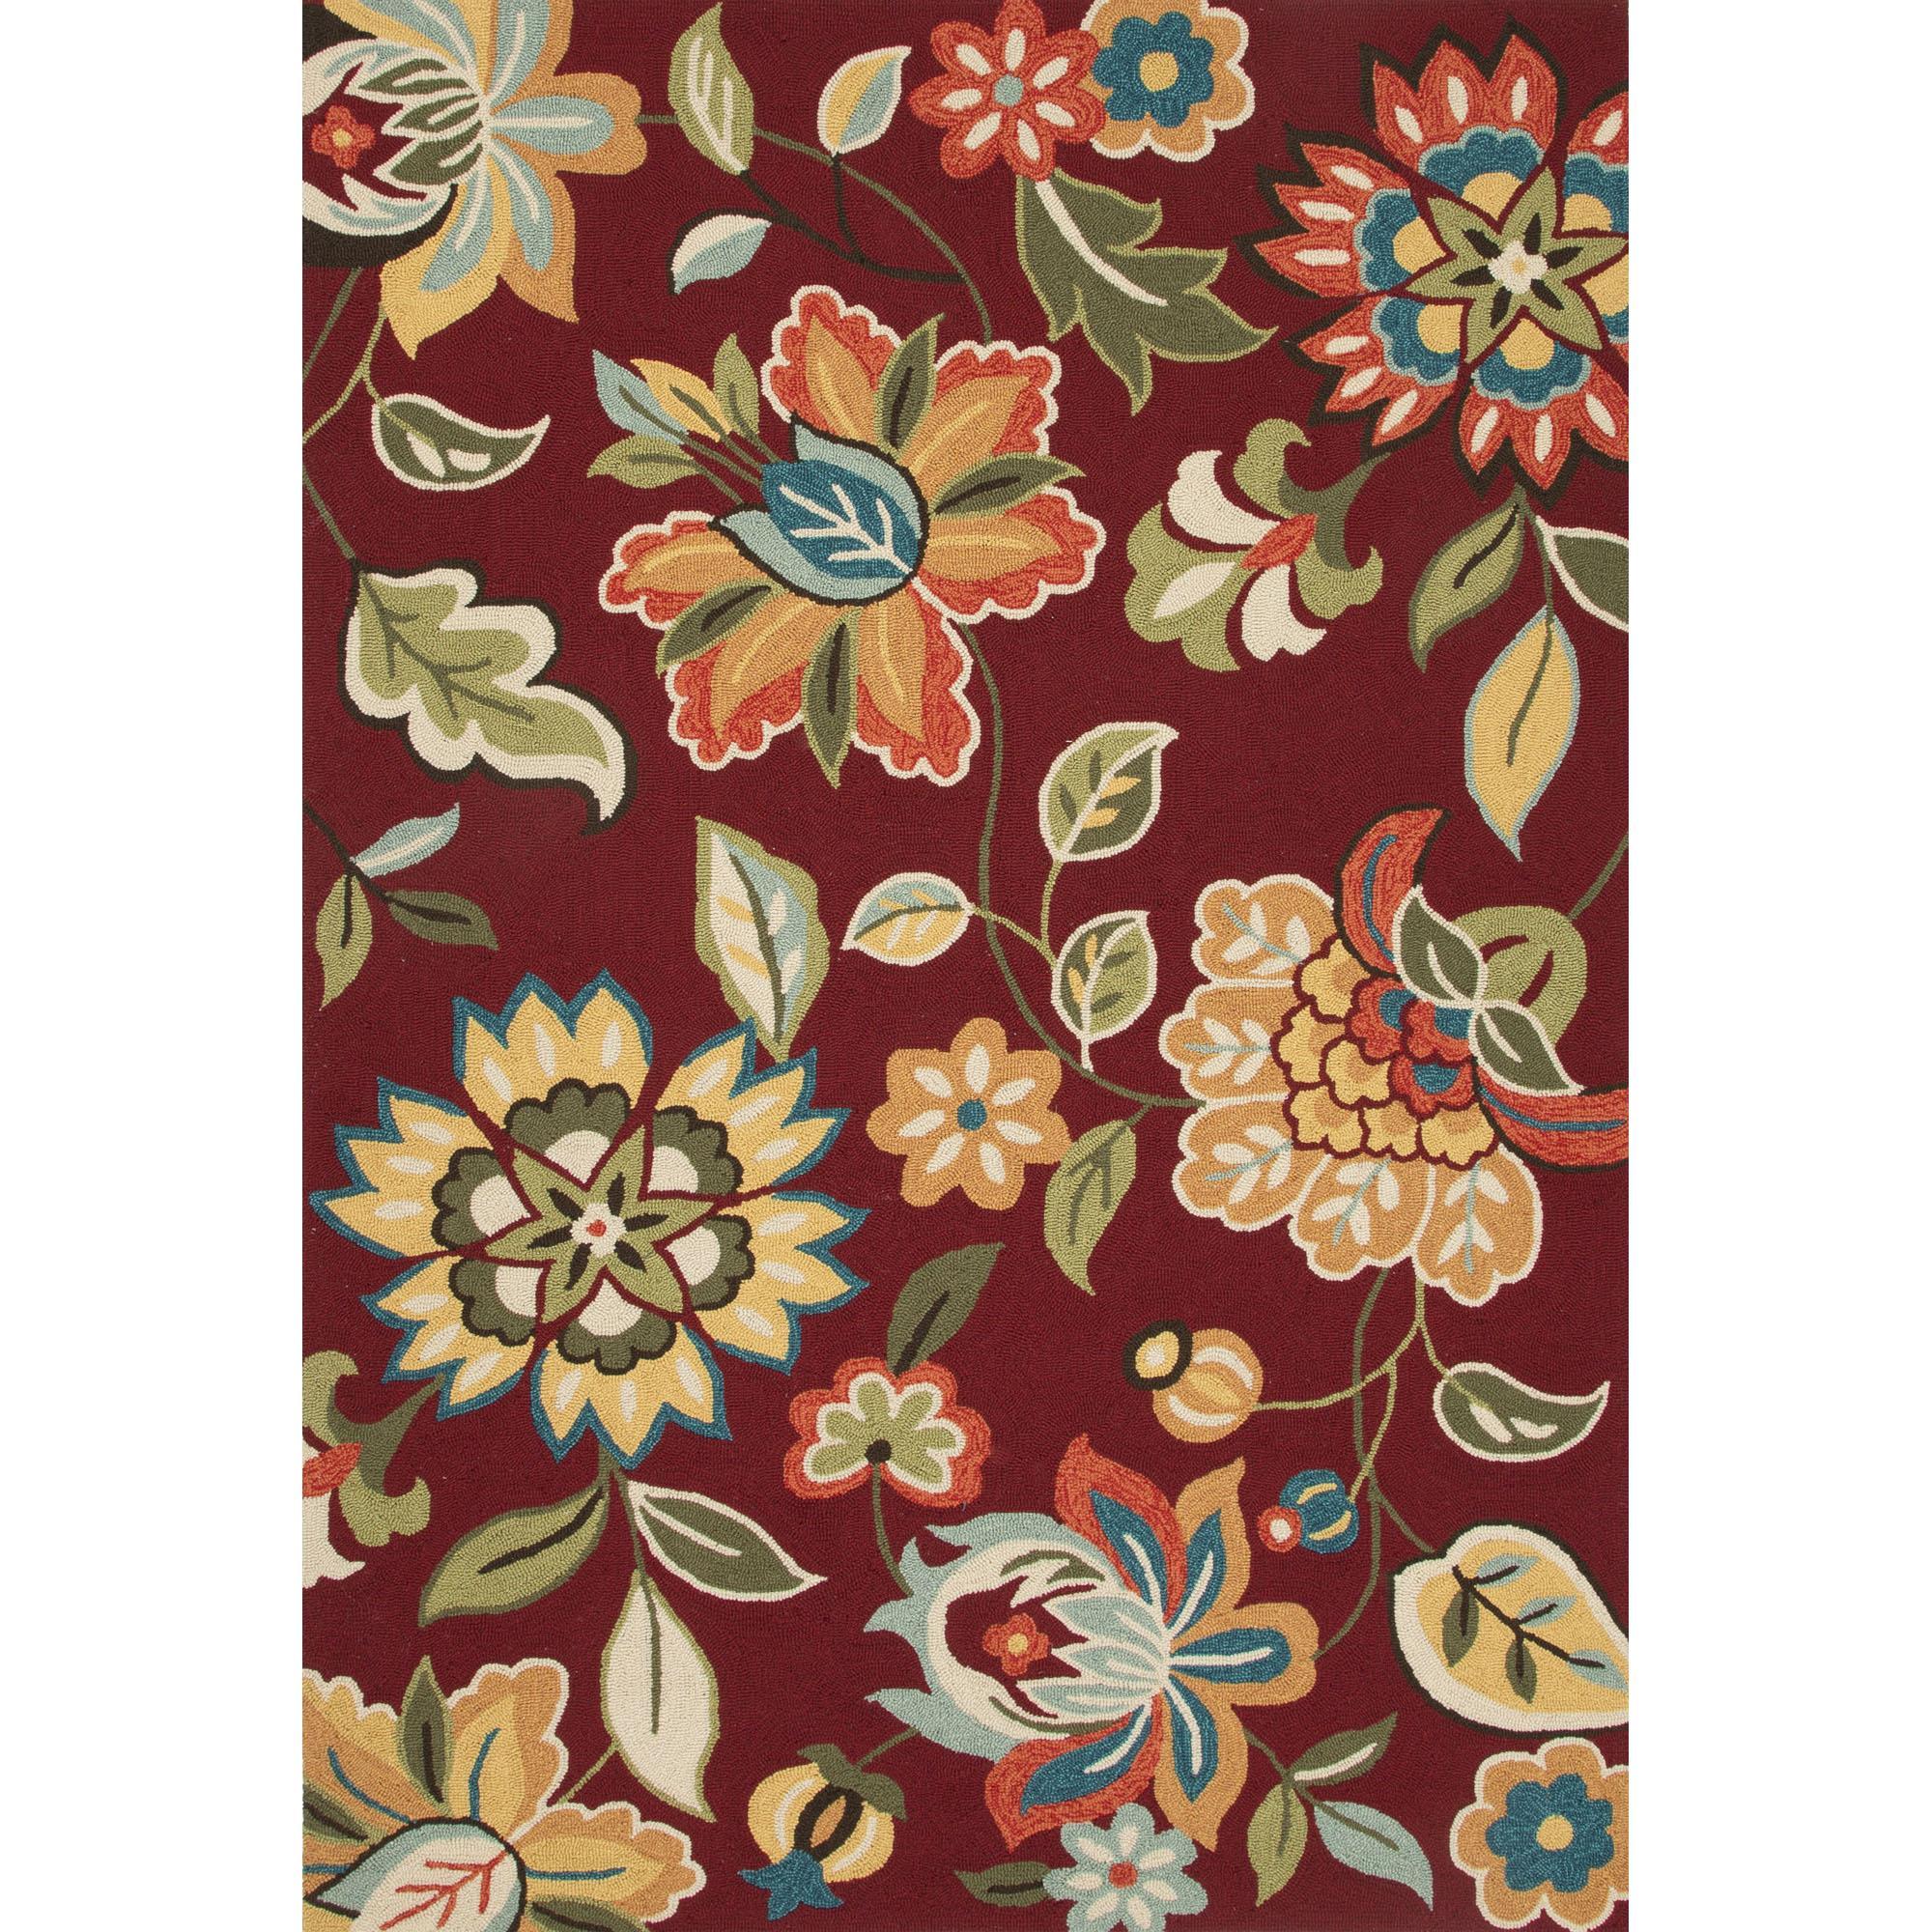 JAIPUR Rugs Blossom 2 x 3 Rug - Item Number: RUG122829